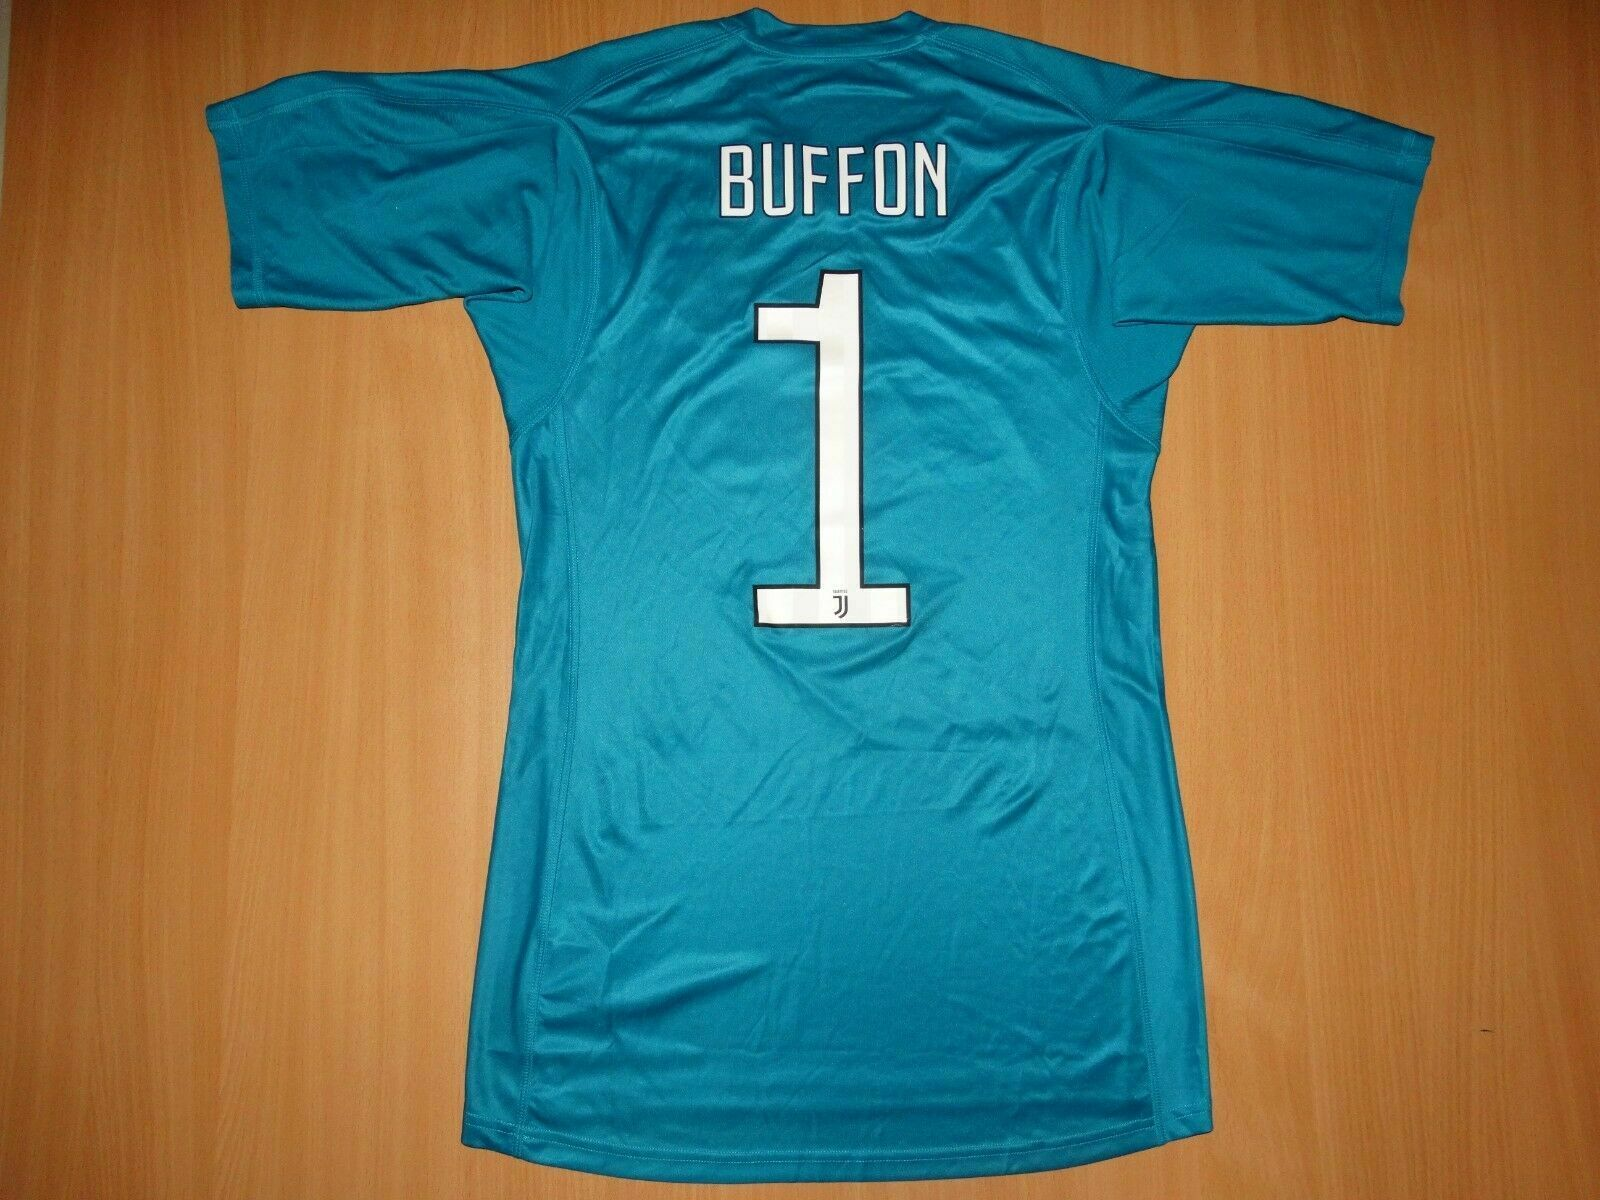 Nuevo 2017 2018 Juventus  1 Buffon lejos Adidas Adizero Camiseta De Fútbol S portero